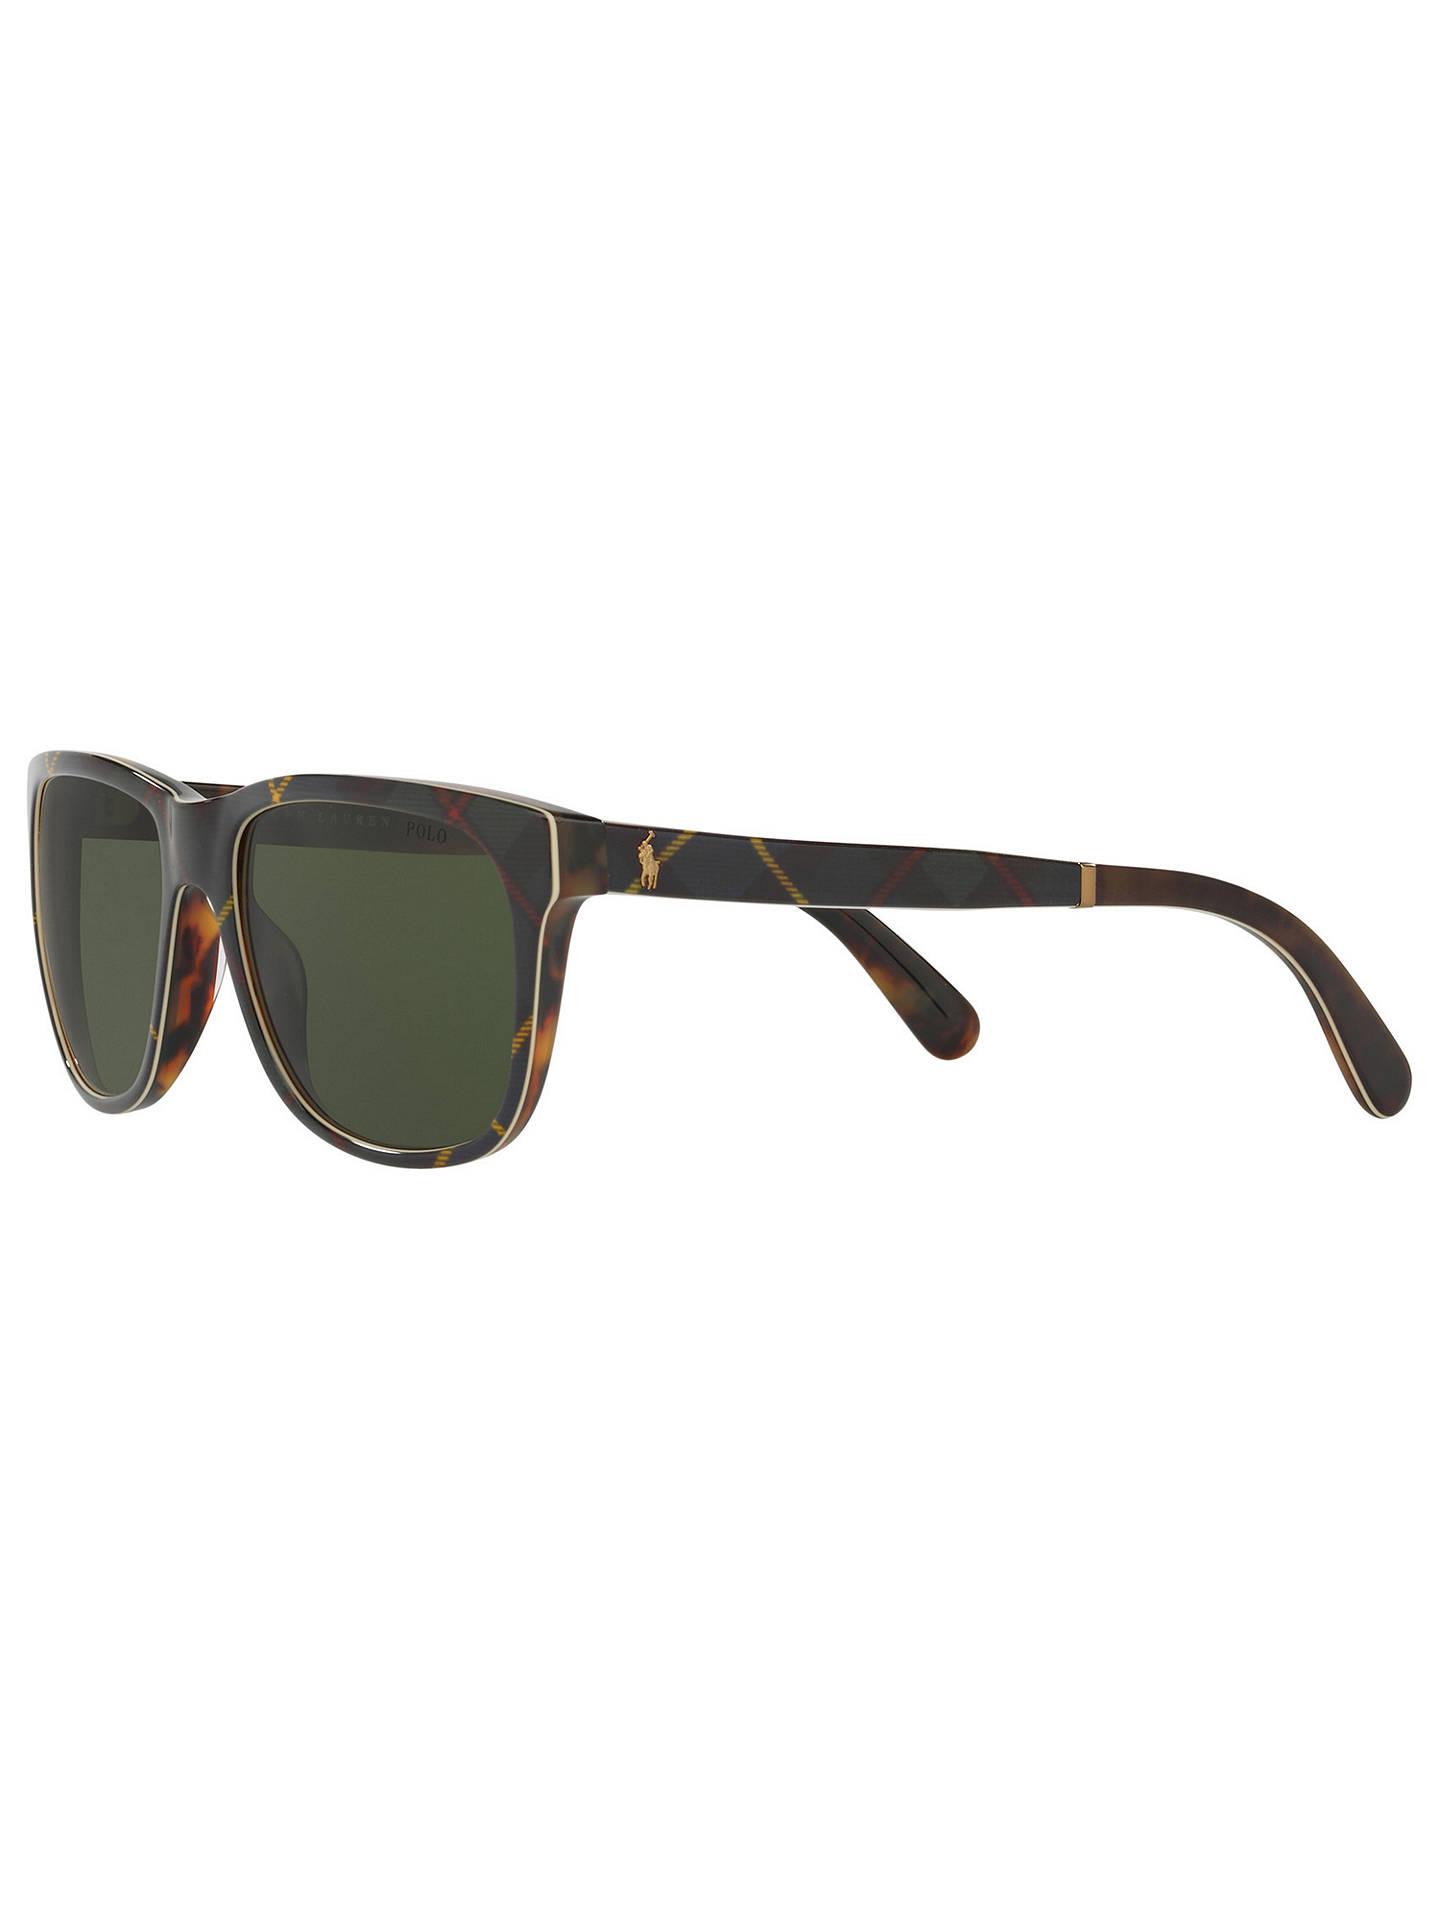 84b414f579b0 ... purchase buypolo ralph lauren ph4116 square sunglasses multi green  online at johnlewis 4f655 fff11